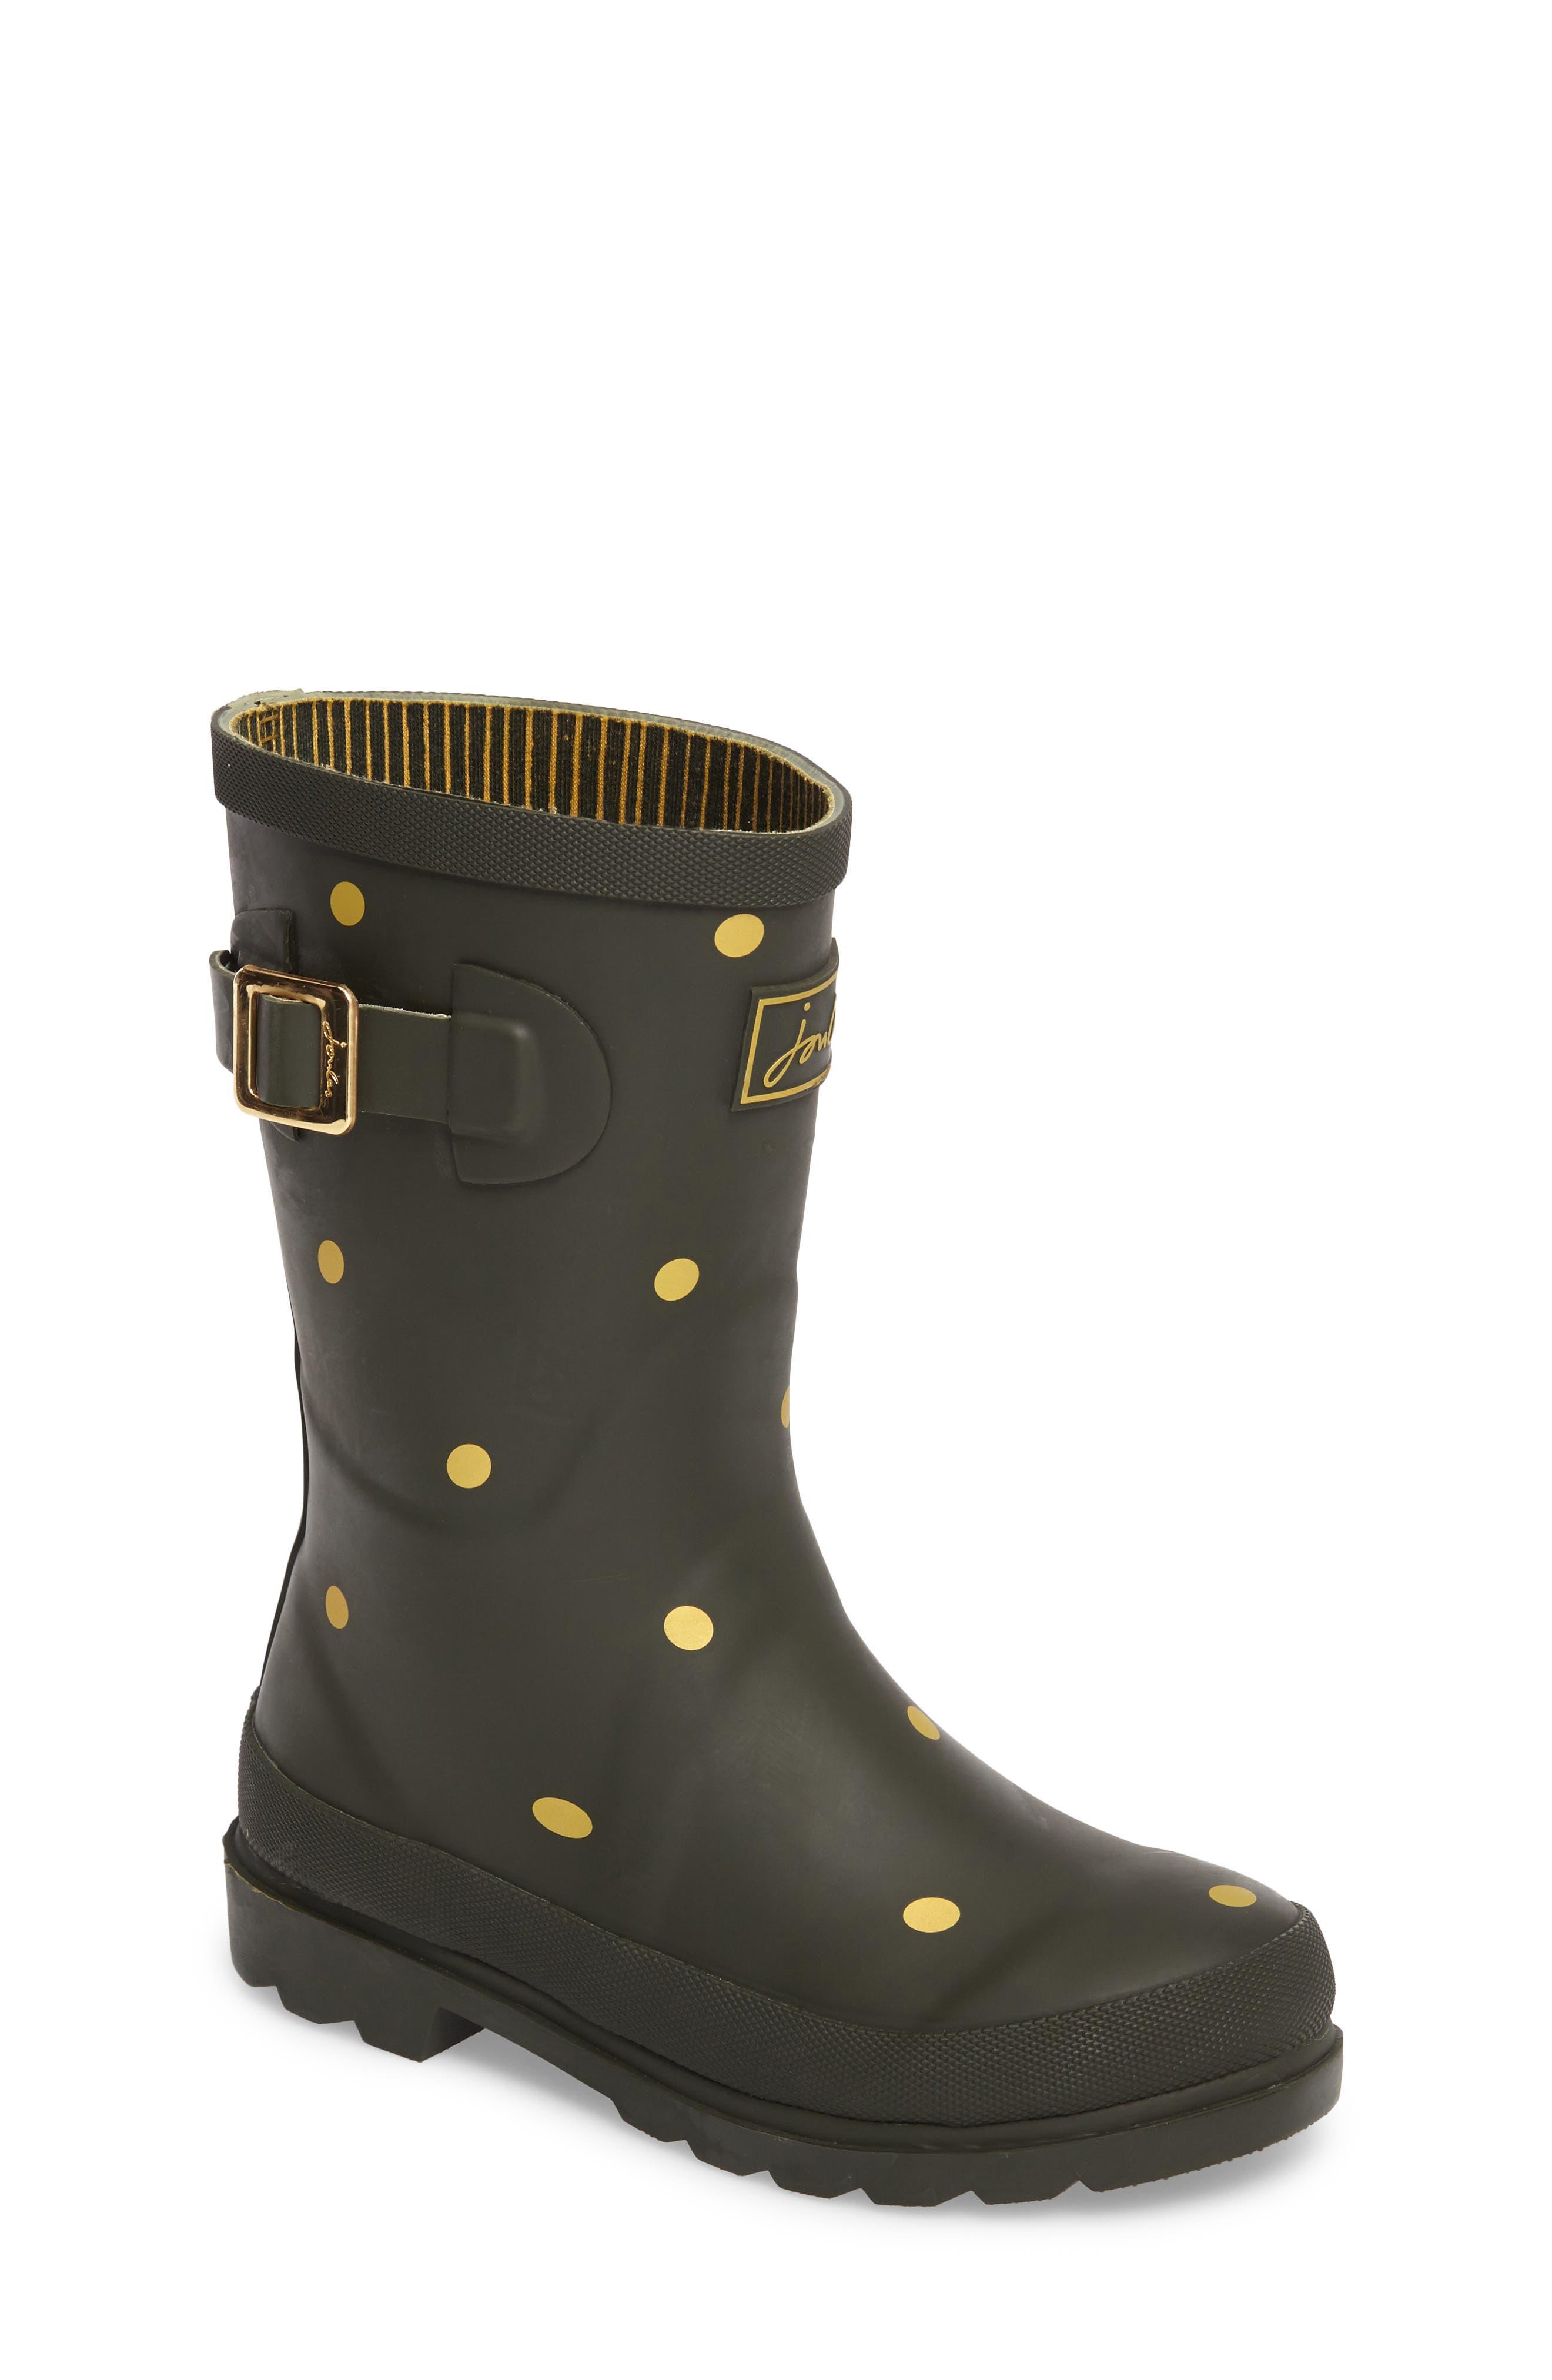 JOULES,                             Welly Printed Waterproof Rain Boot,                             Main thumbnail 1, color,                             302